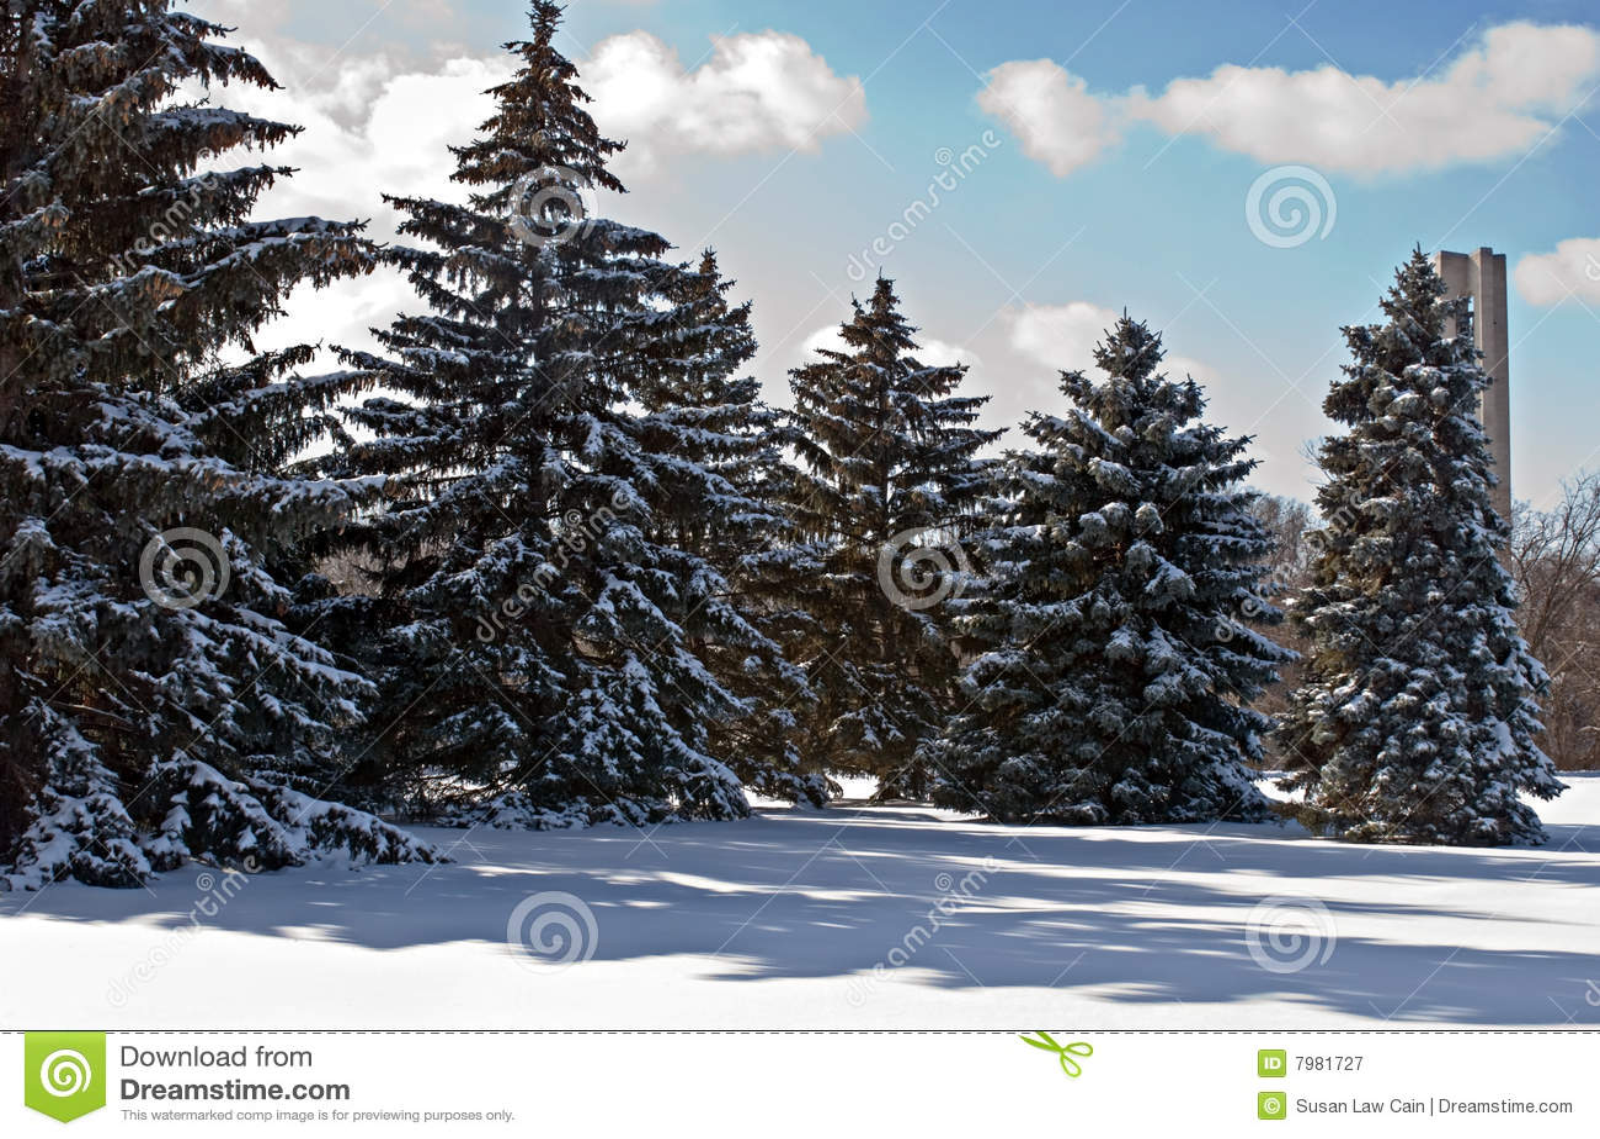 spruce tree snow - photo #42